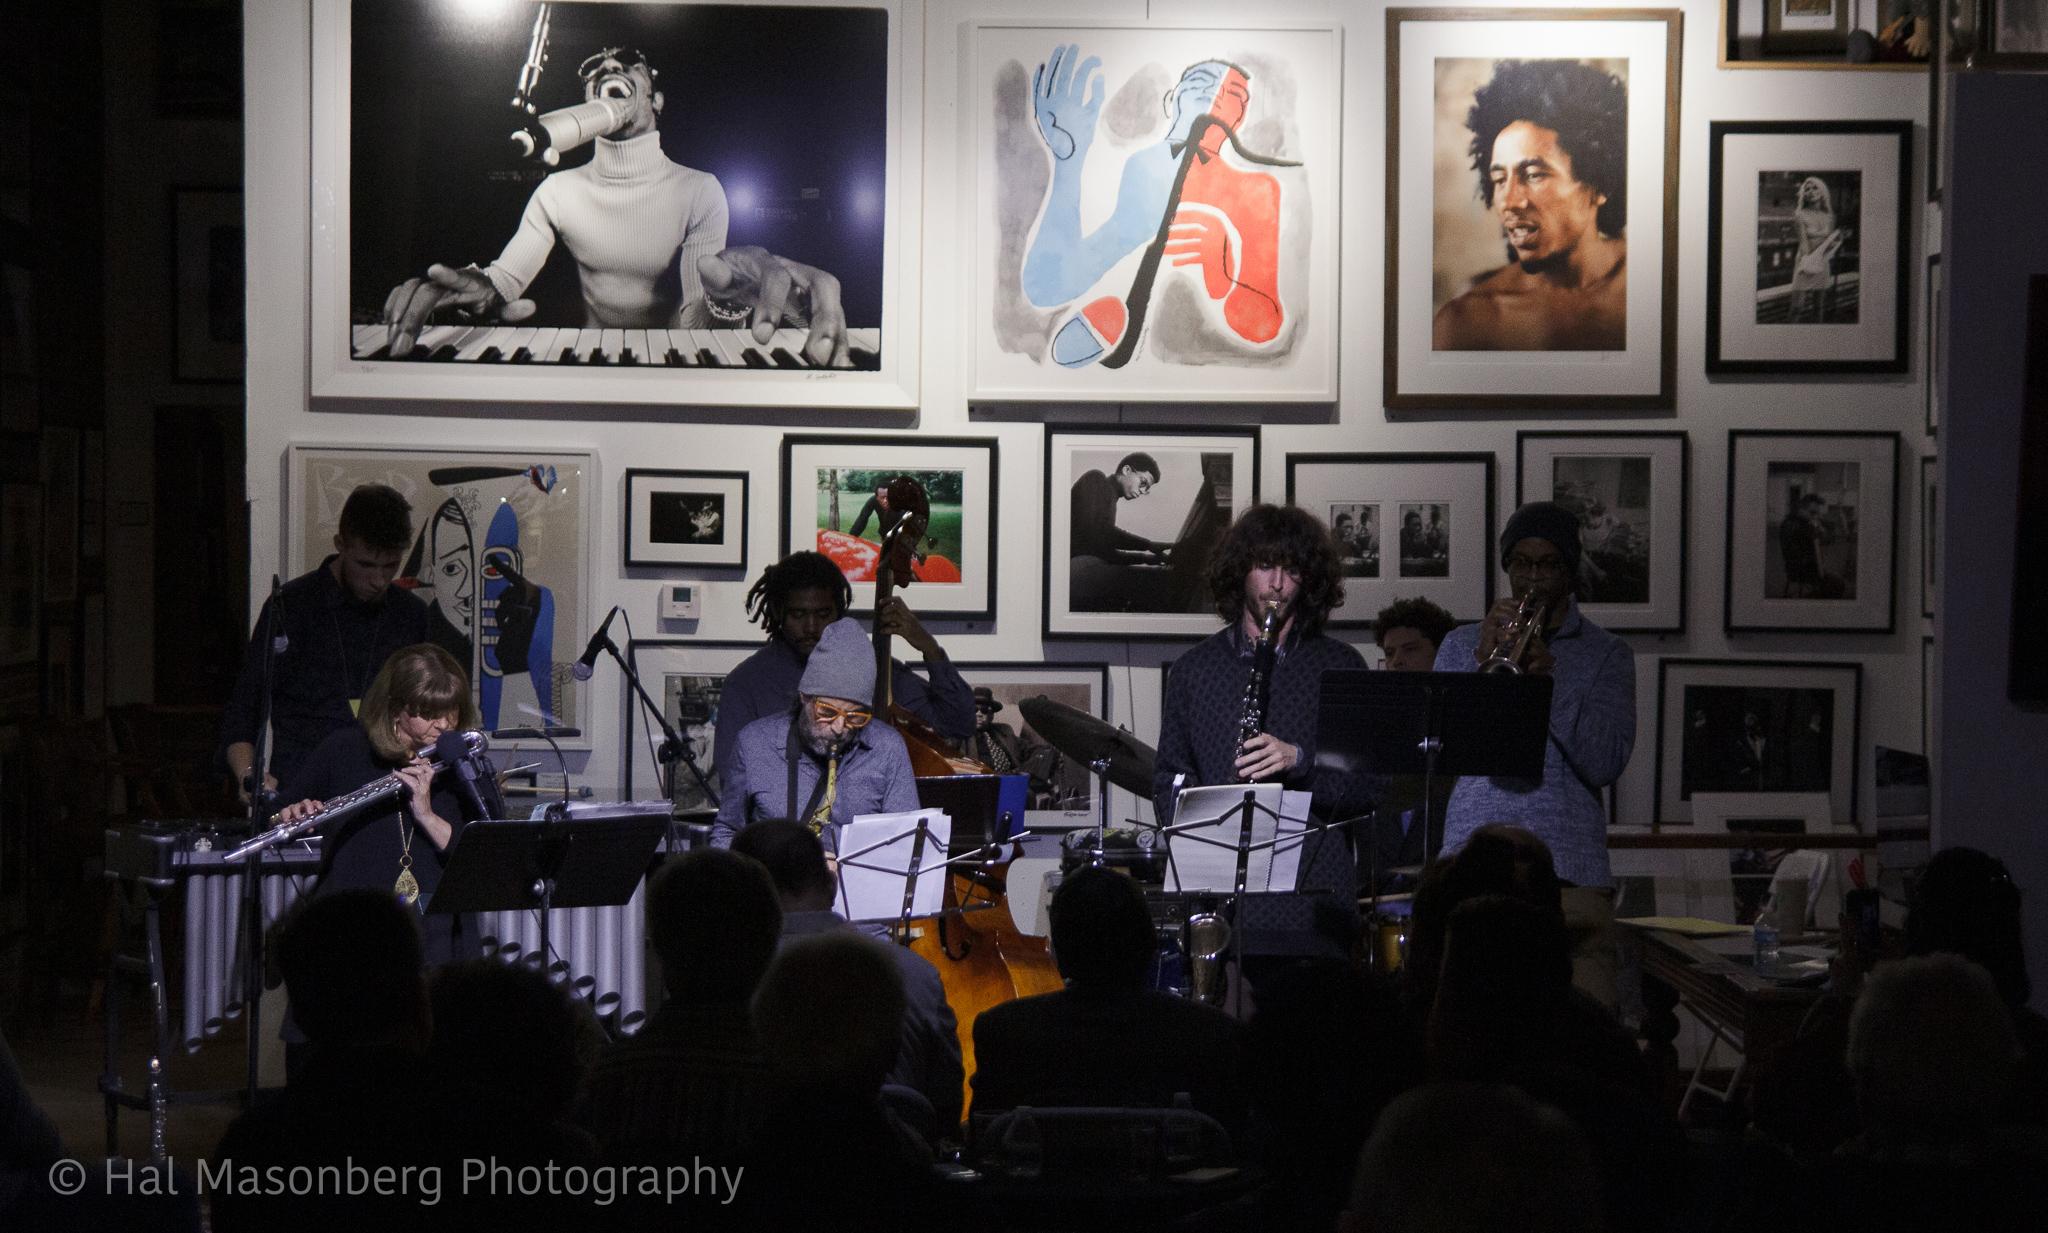 DAVID BINNEY & FRIENDS: MUSINGS ON A MUSICAL PROPHET